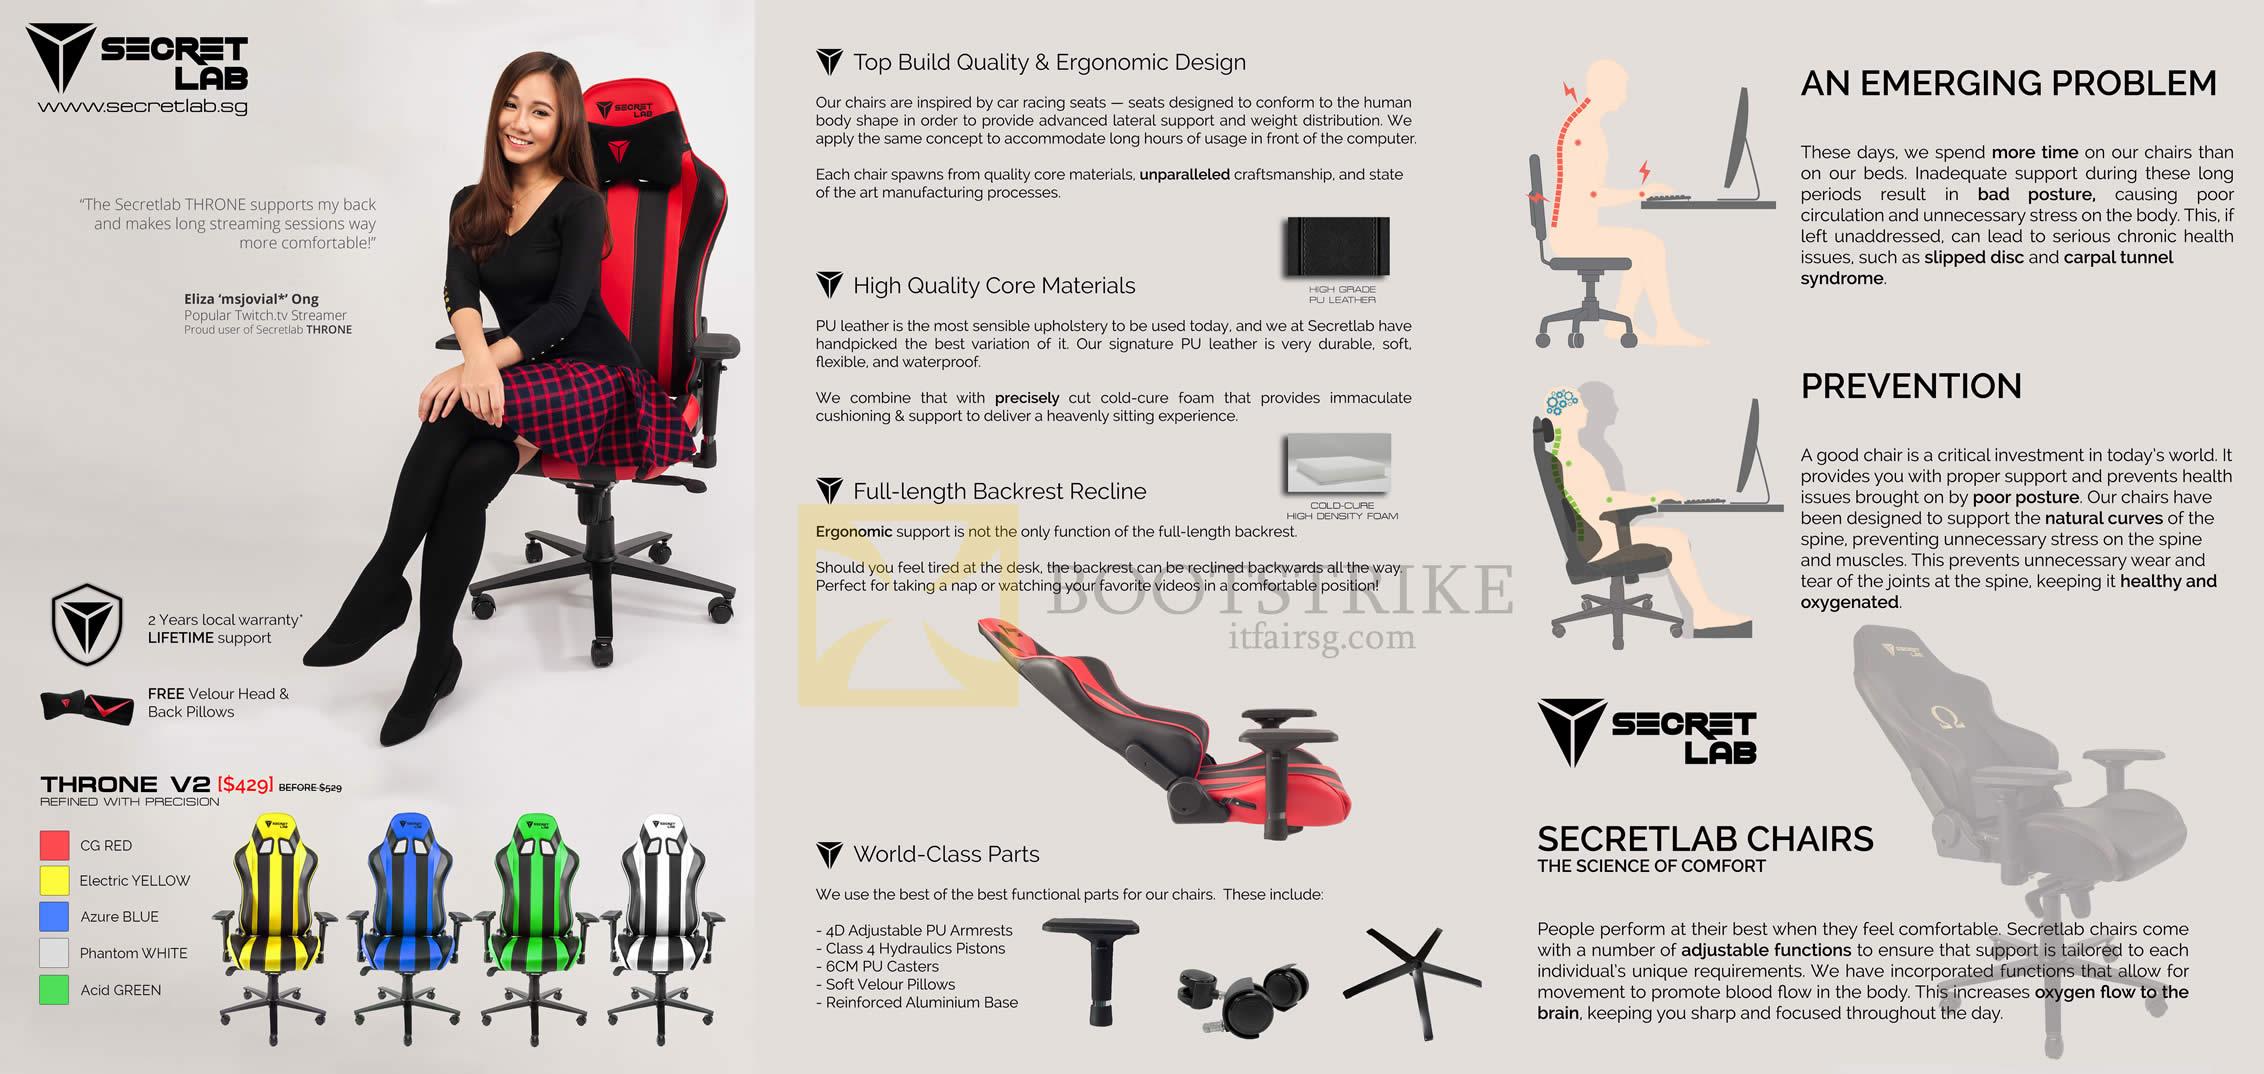 Corporate chair massage flyer - 2016 Price List Brochure Flyer Image Corporate Chair Massage Flyer